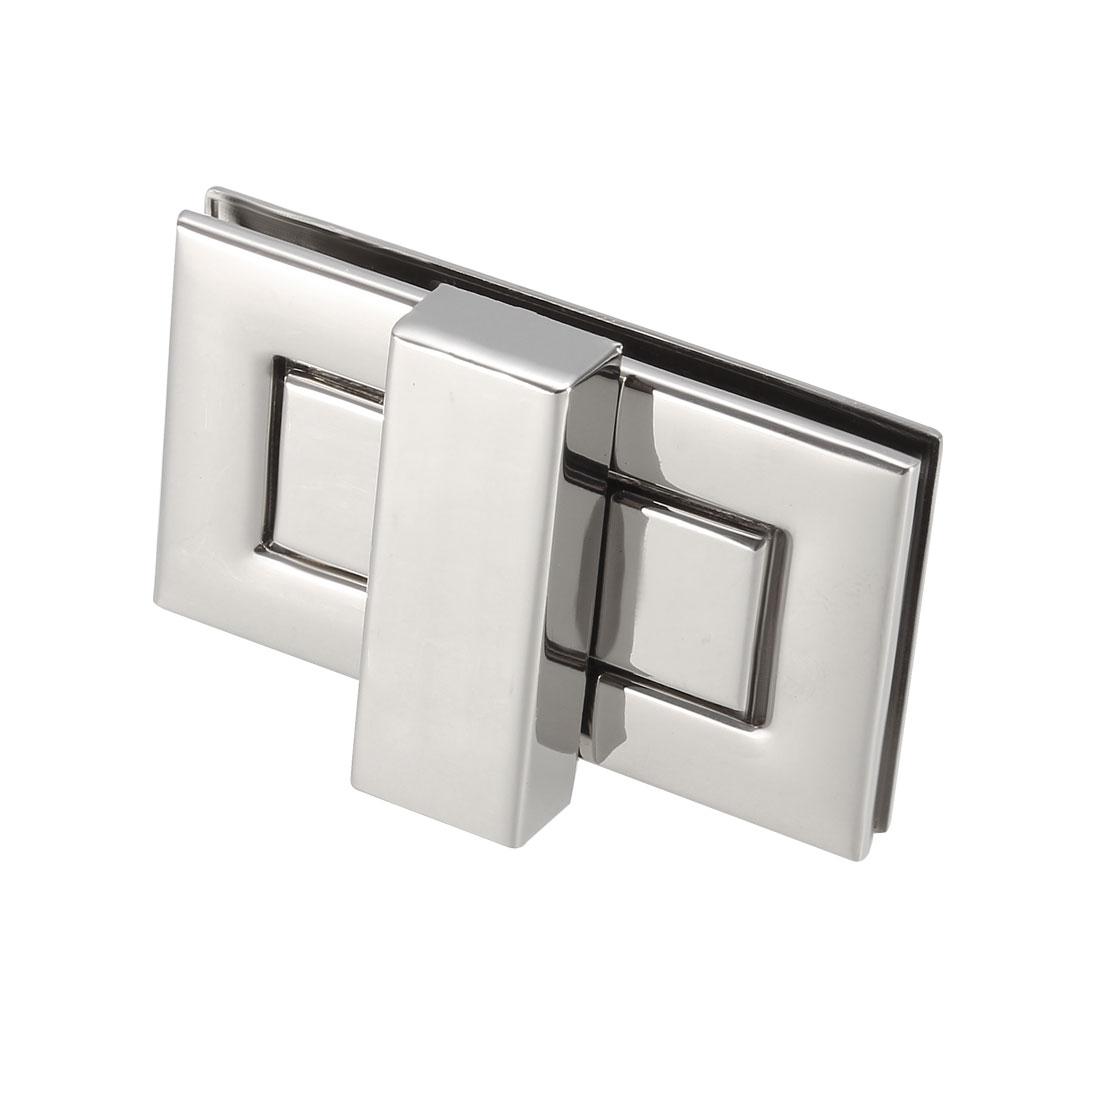 1 Set Rectangular Purses Twist Lock 52mm x 29mm Clutches Closures - Silver